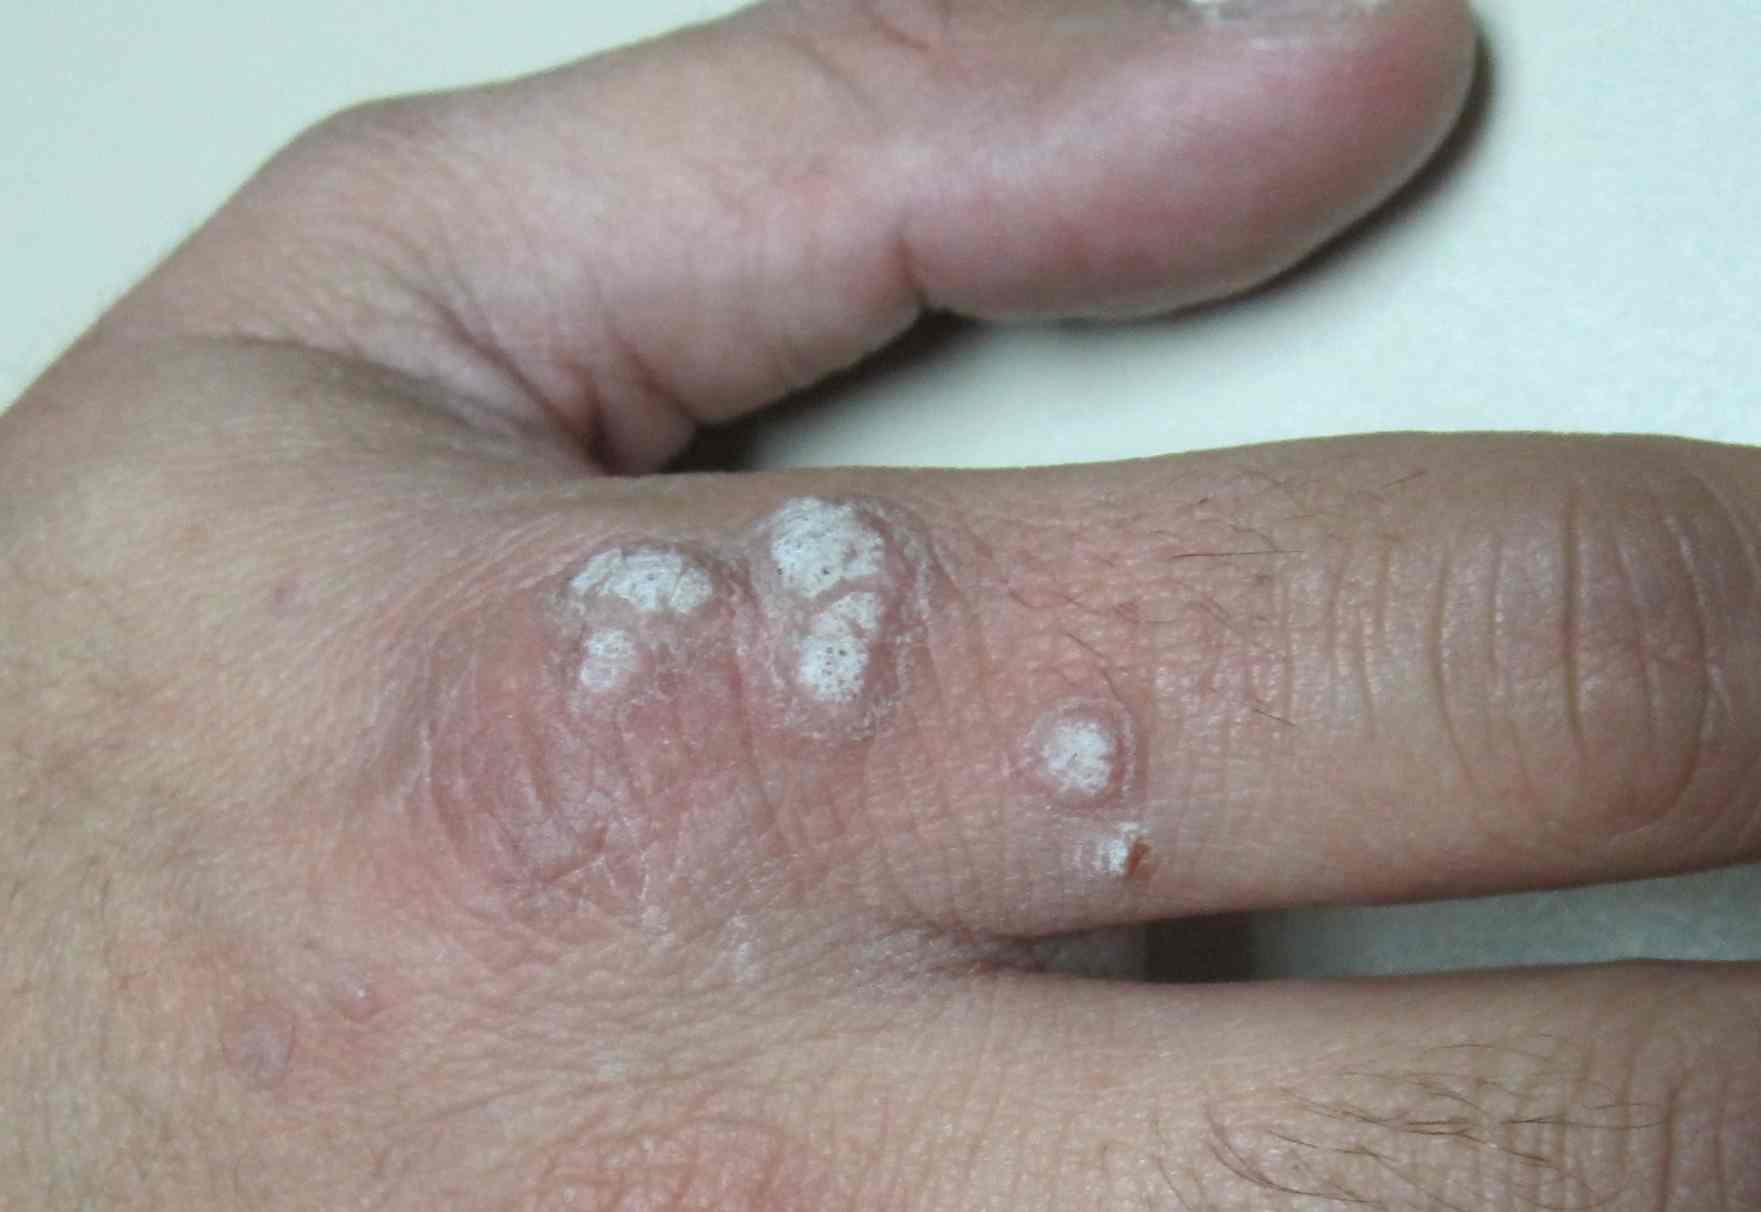 medicamento para virus del papiloma humano en hombres wart on foot palm